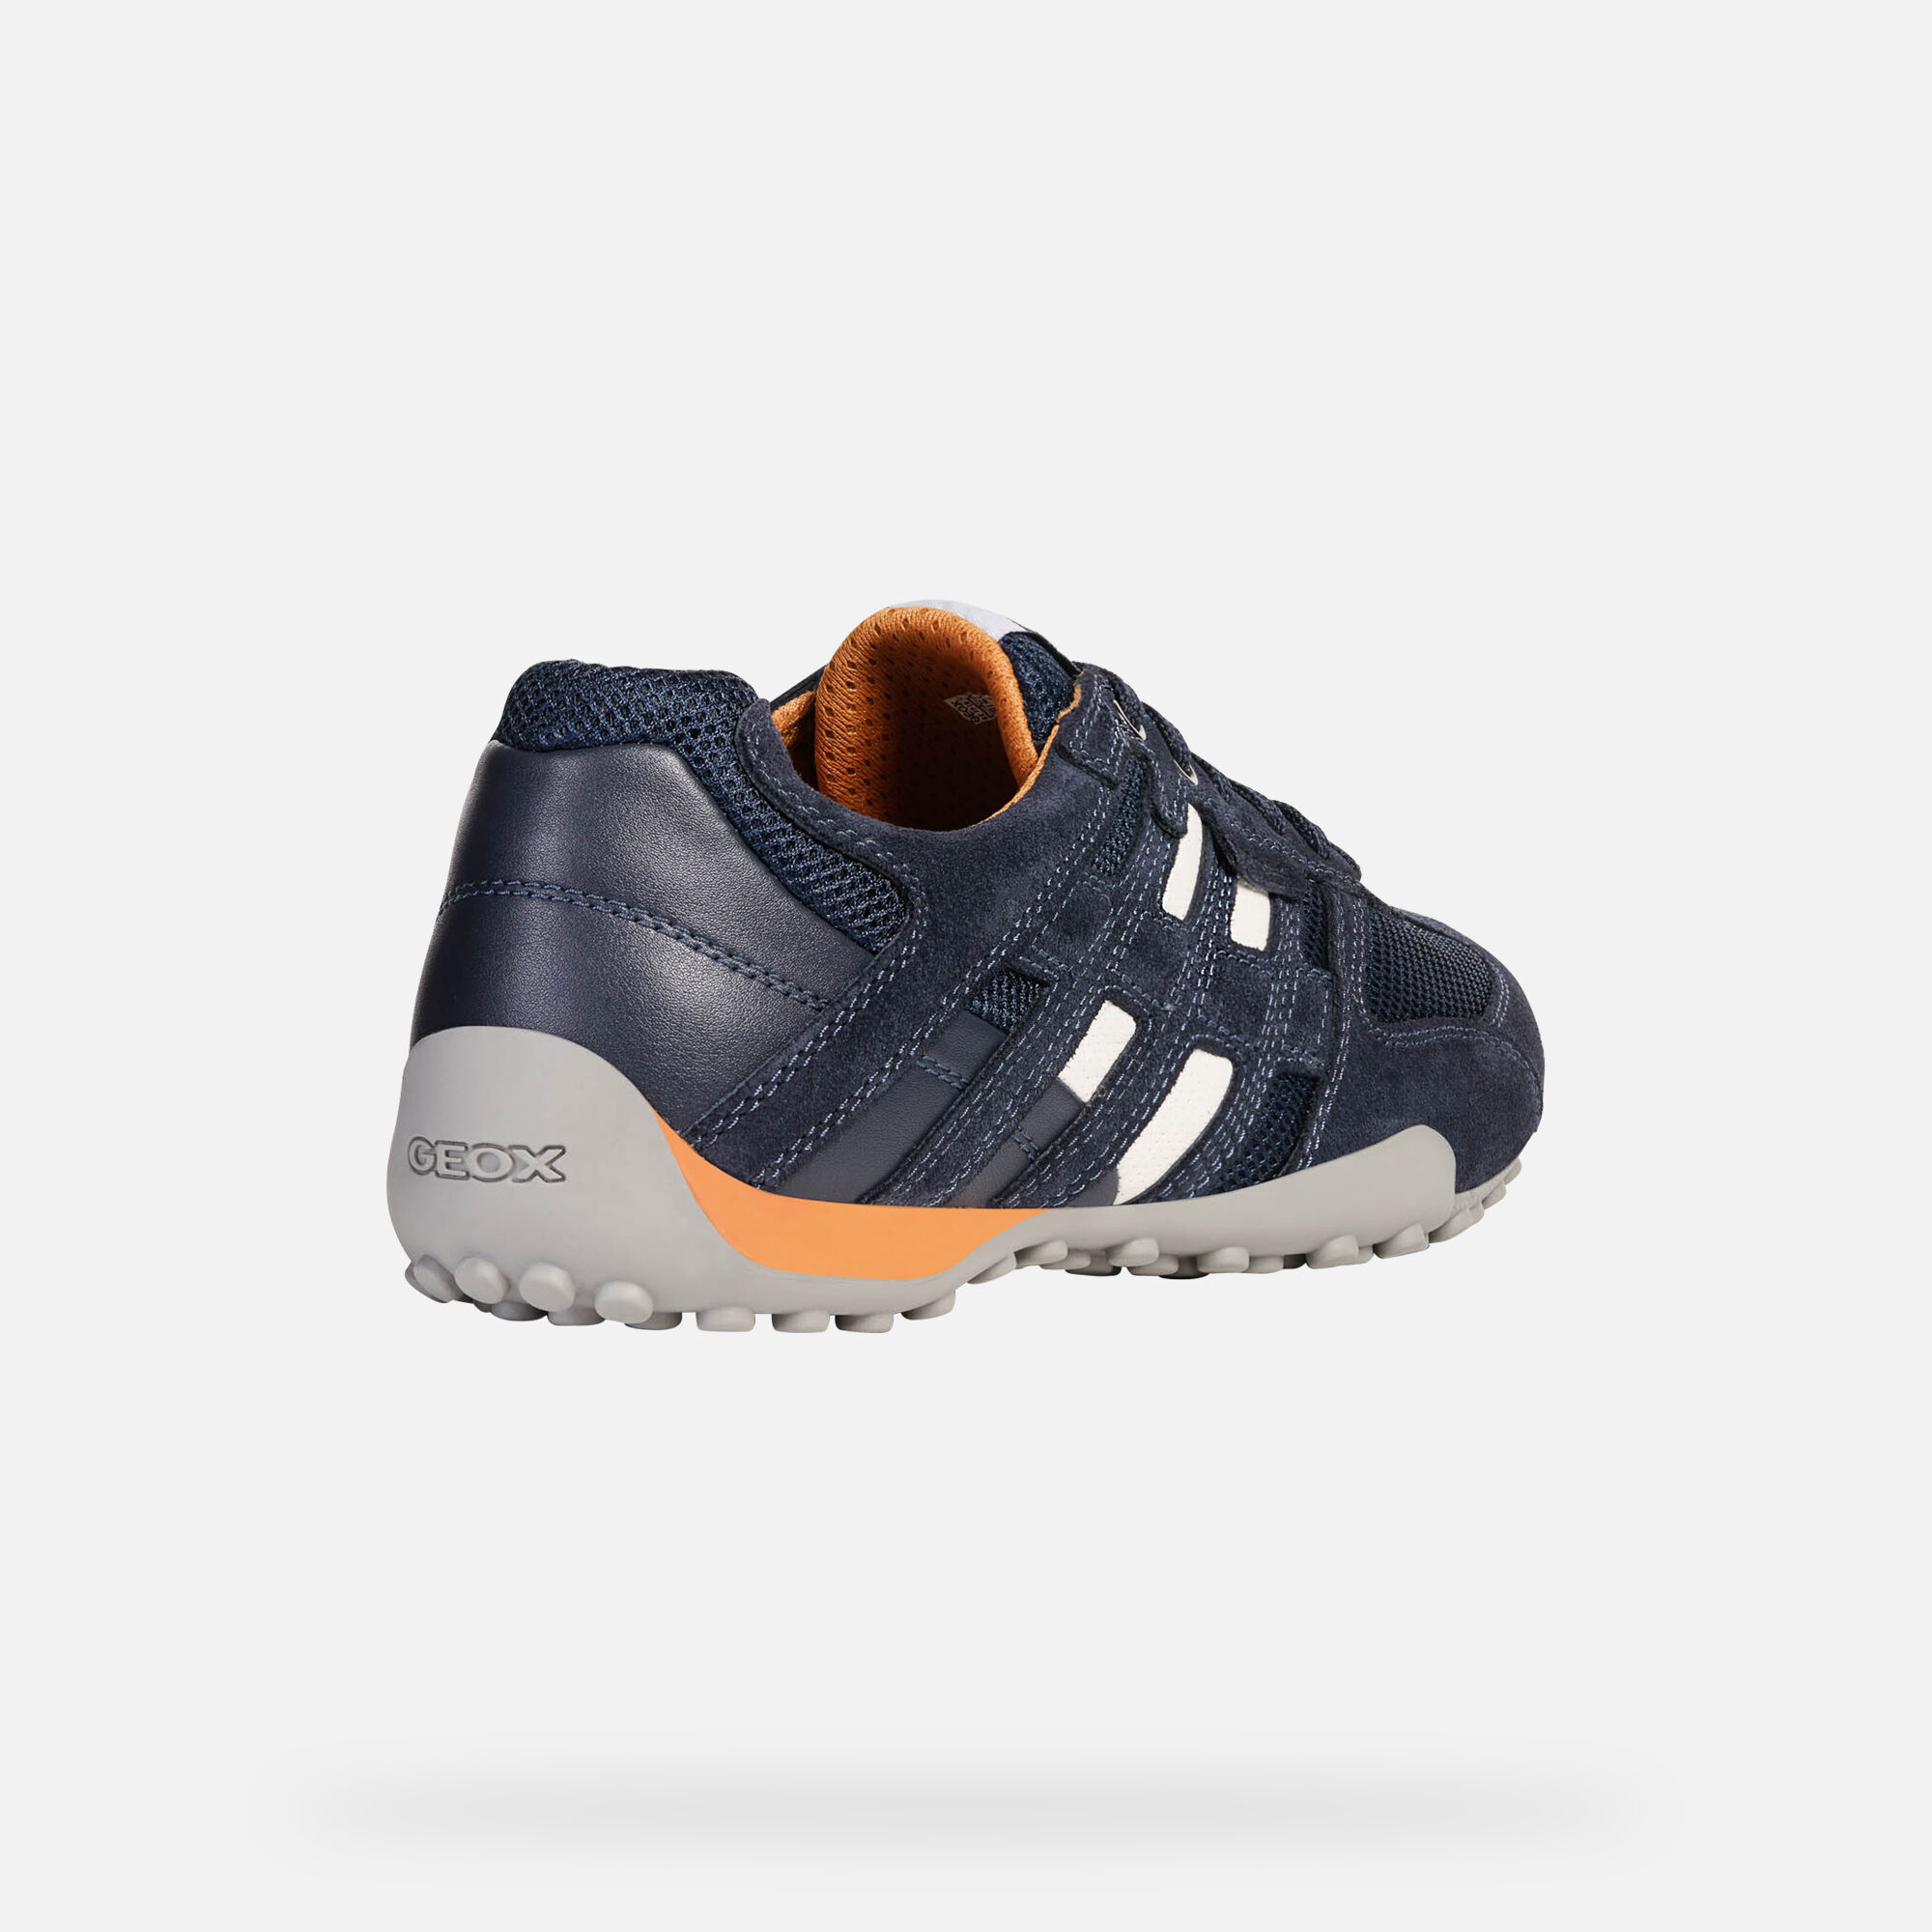 Geox UOMO SNAKE: Blue Navy Man Sneakers   Geox SS19